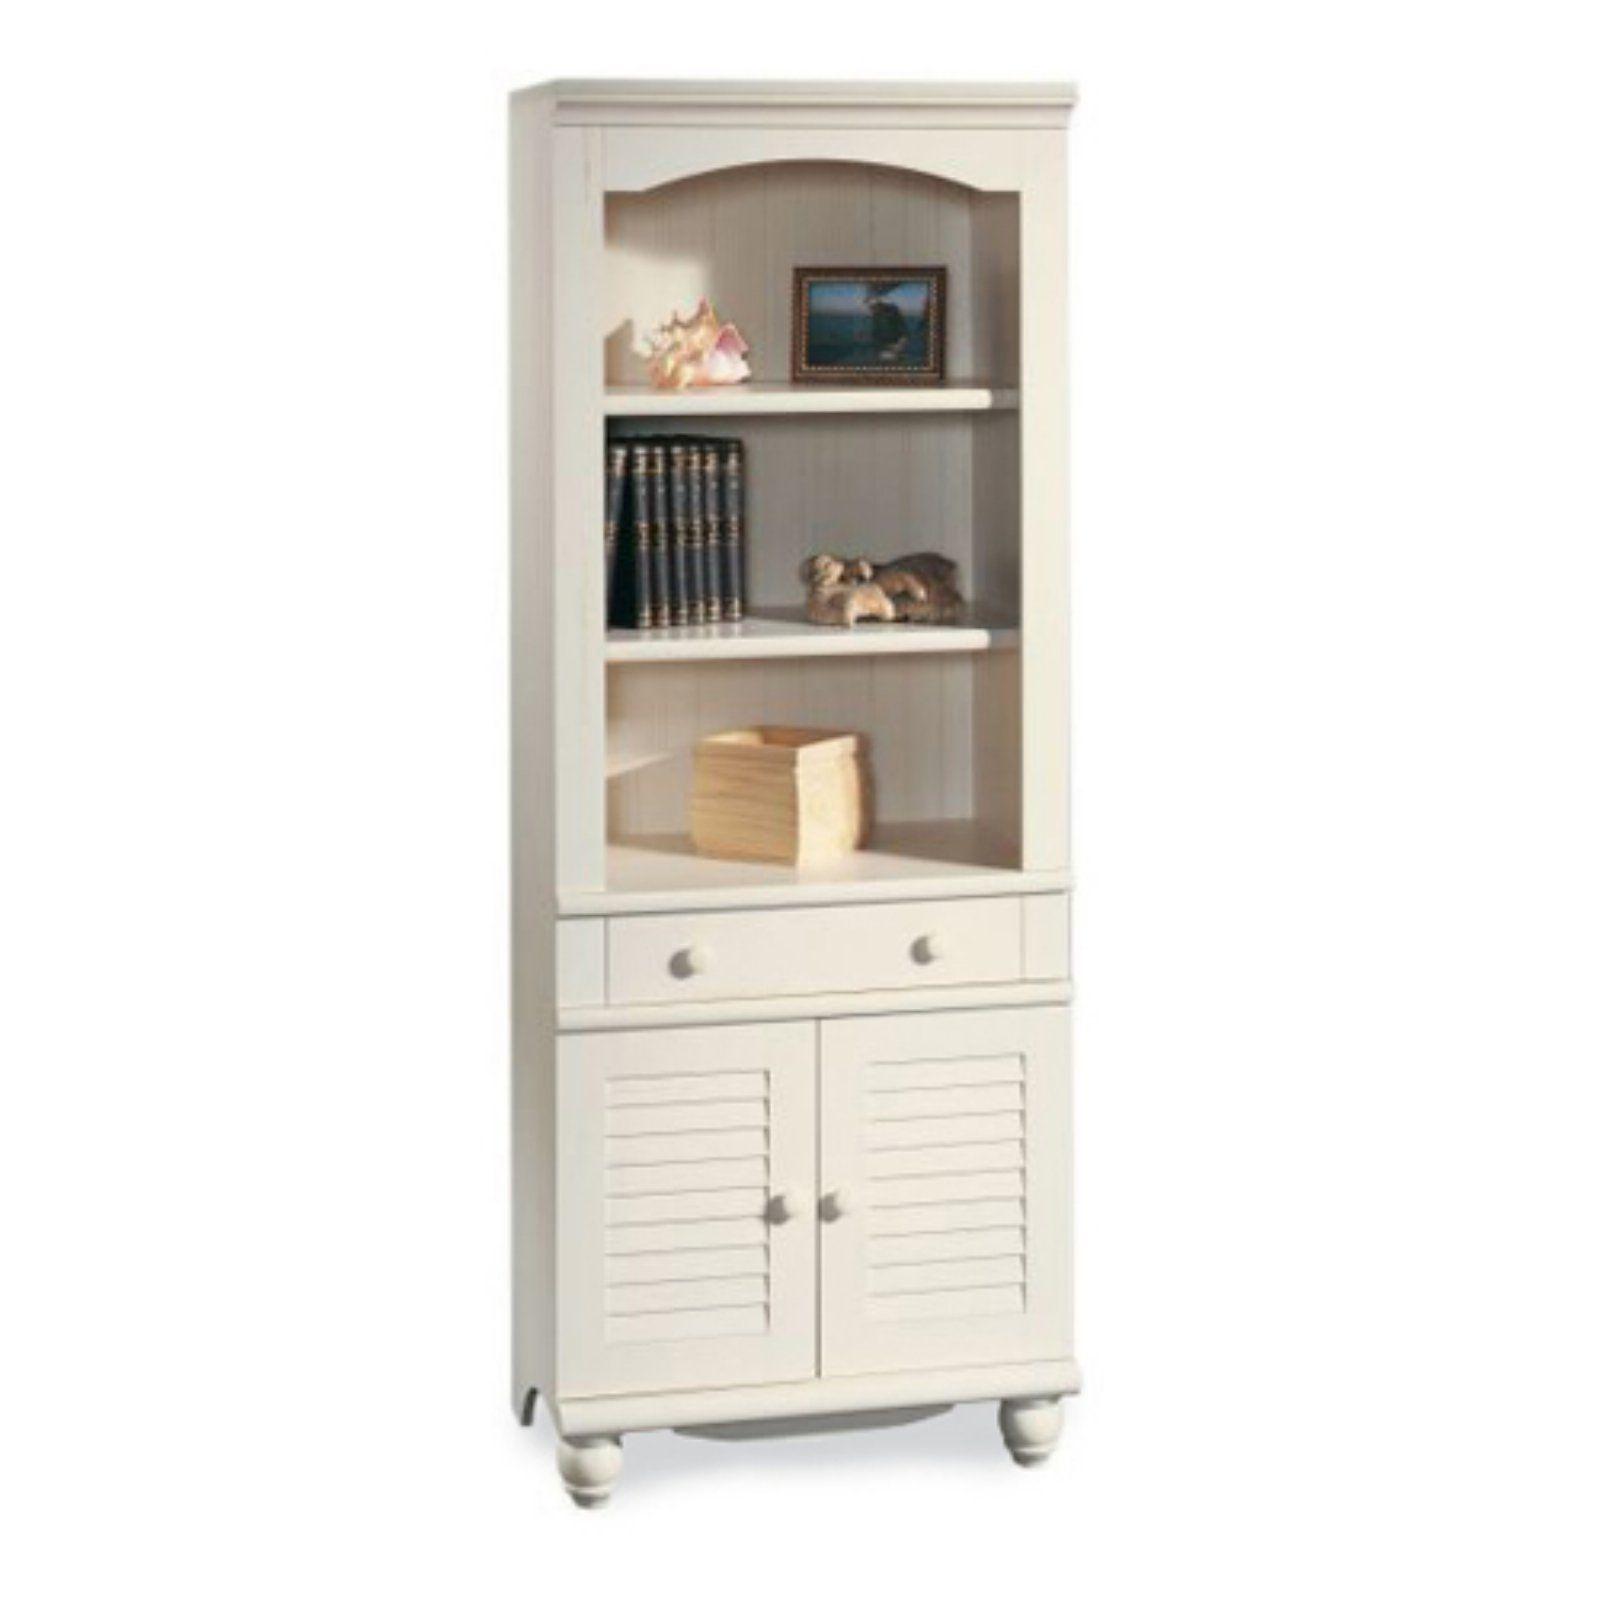 Sauder Harbor View Bookcase With Doors Antique White Bathroom